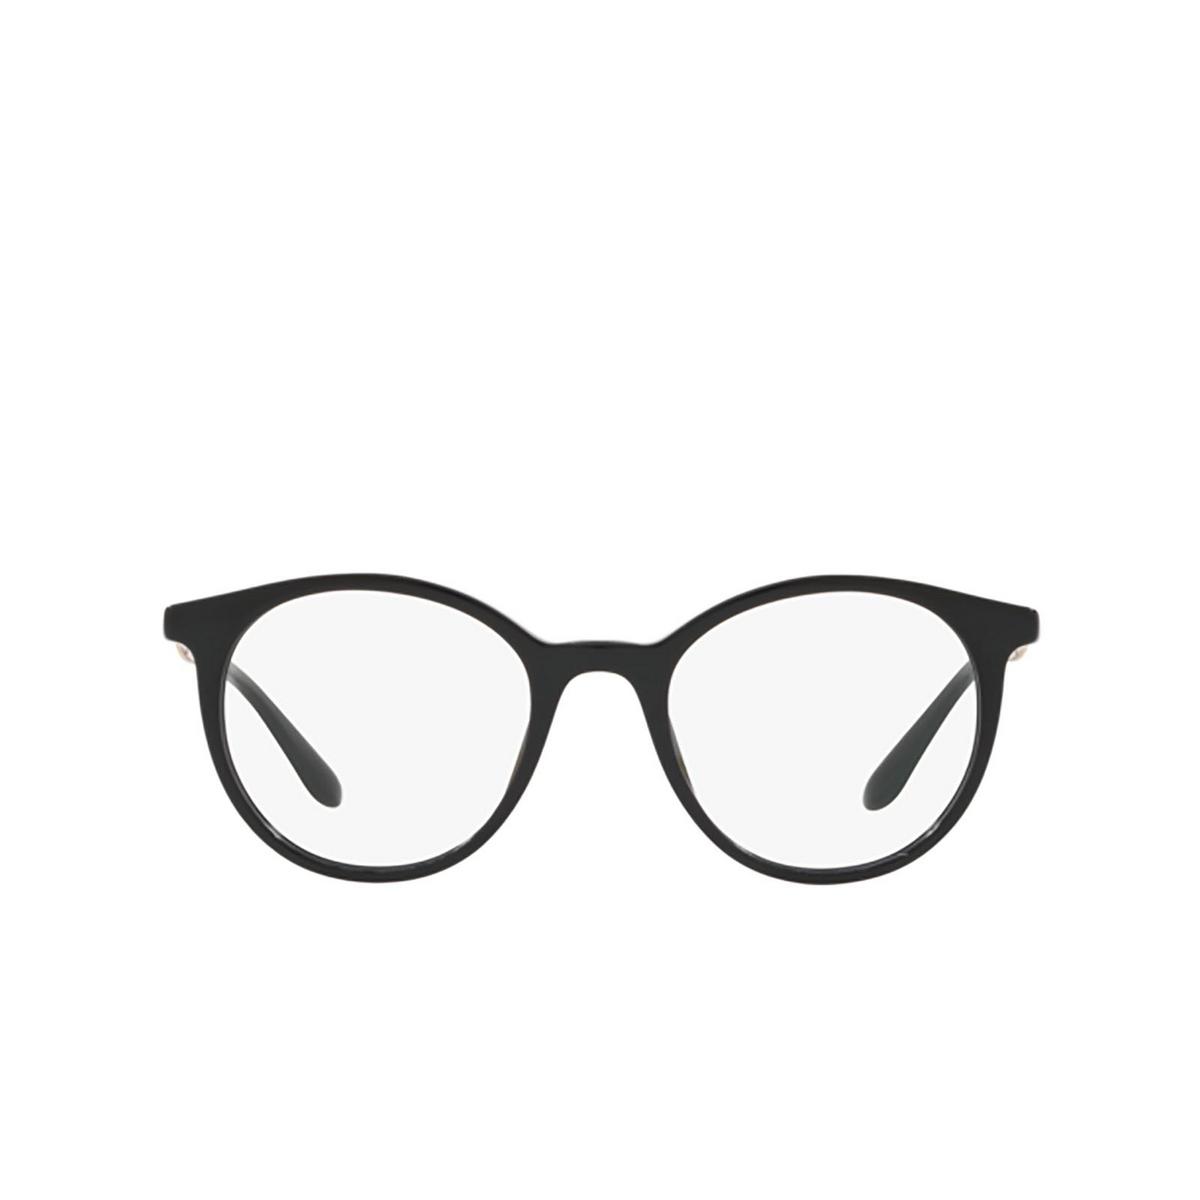 Dolce & Gabbana® Round Eyeglasses: DG3292 color 501 - front view.